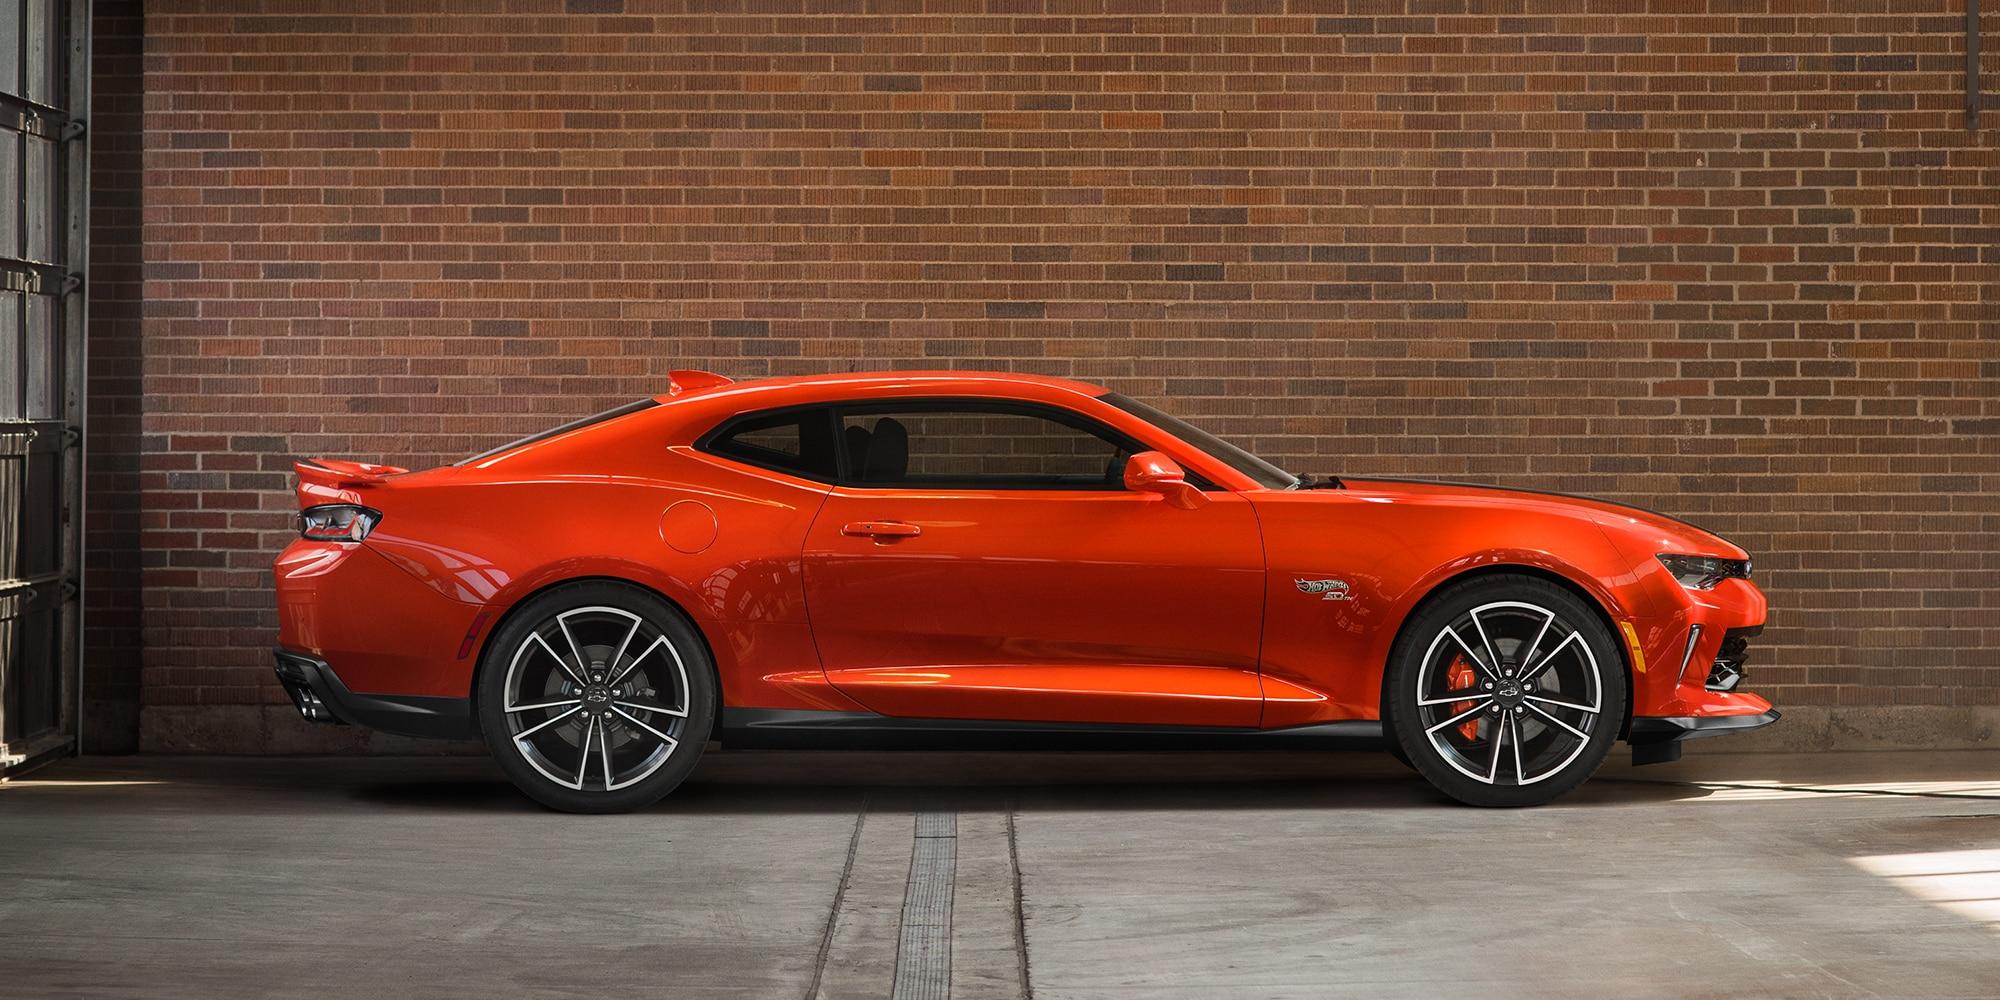 Chevrolet Camaro Hot Wheels Edition: Exterior lateral